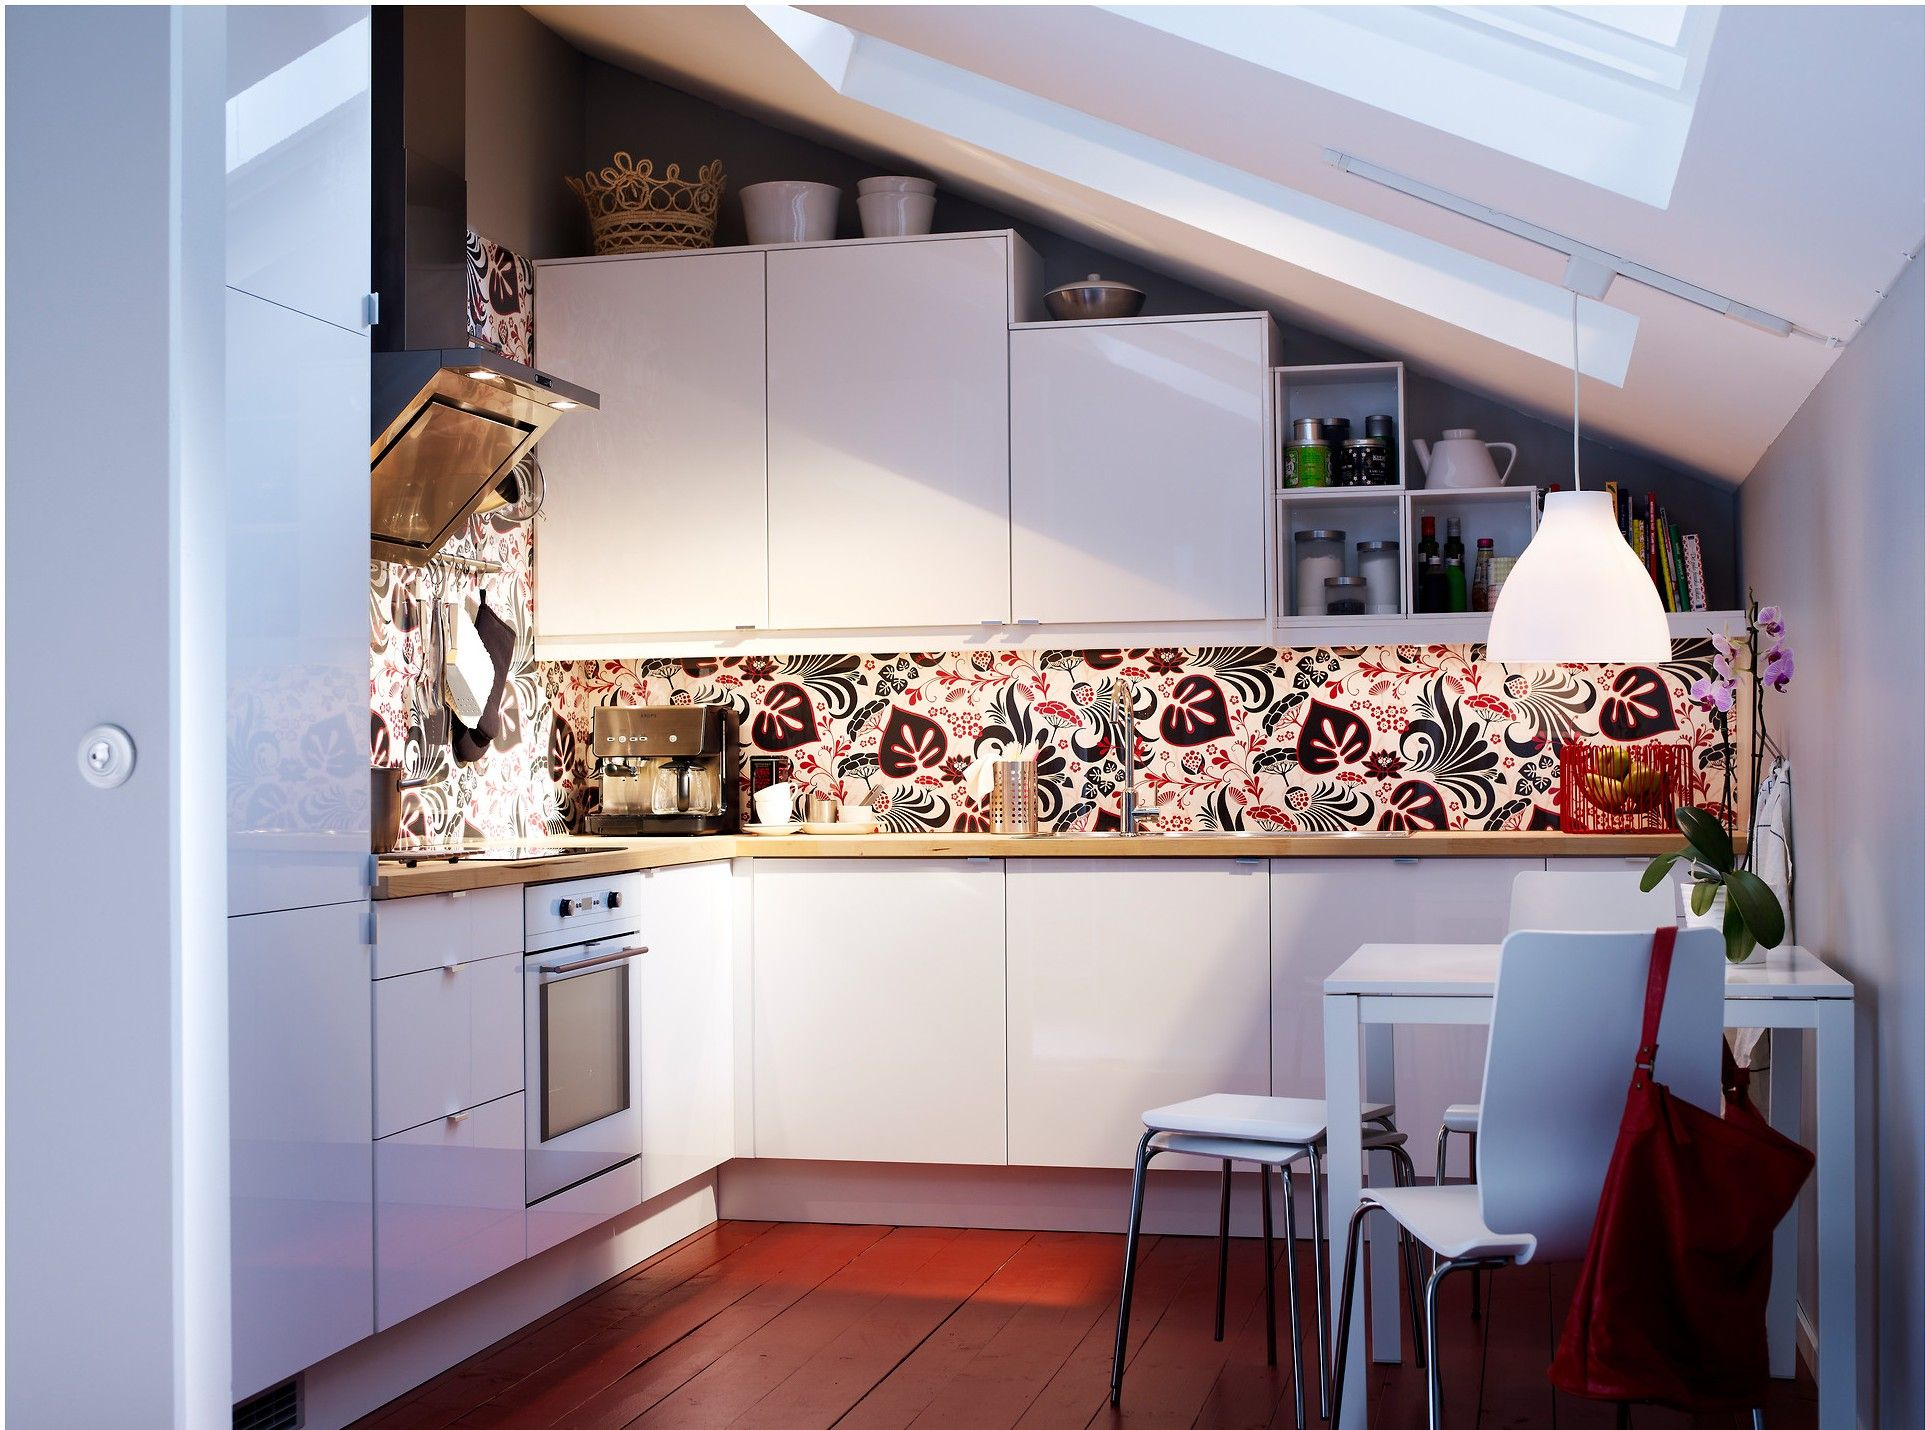 Come progettare la cucina in mansarda | Cucinare in mansarda ...